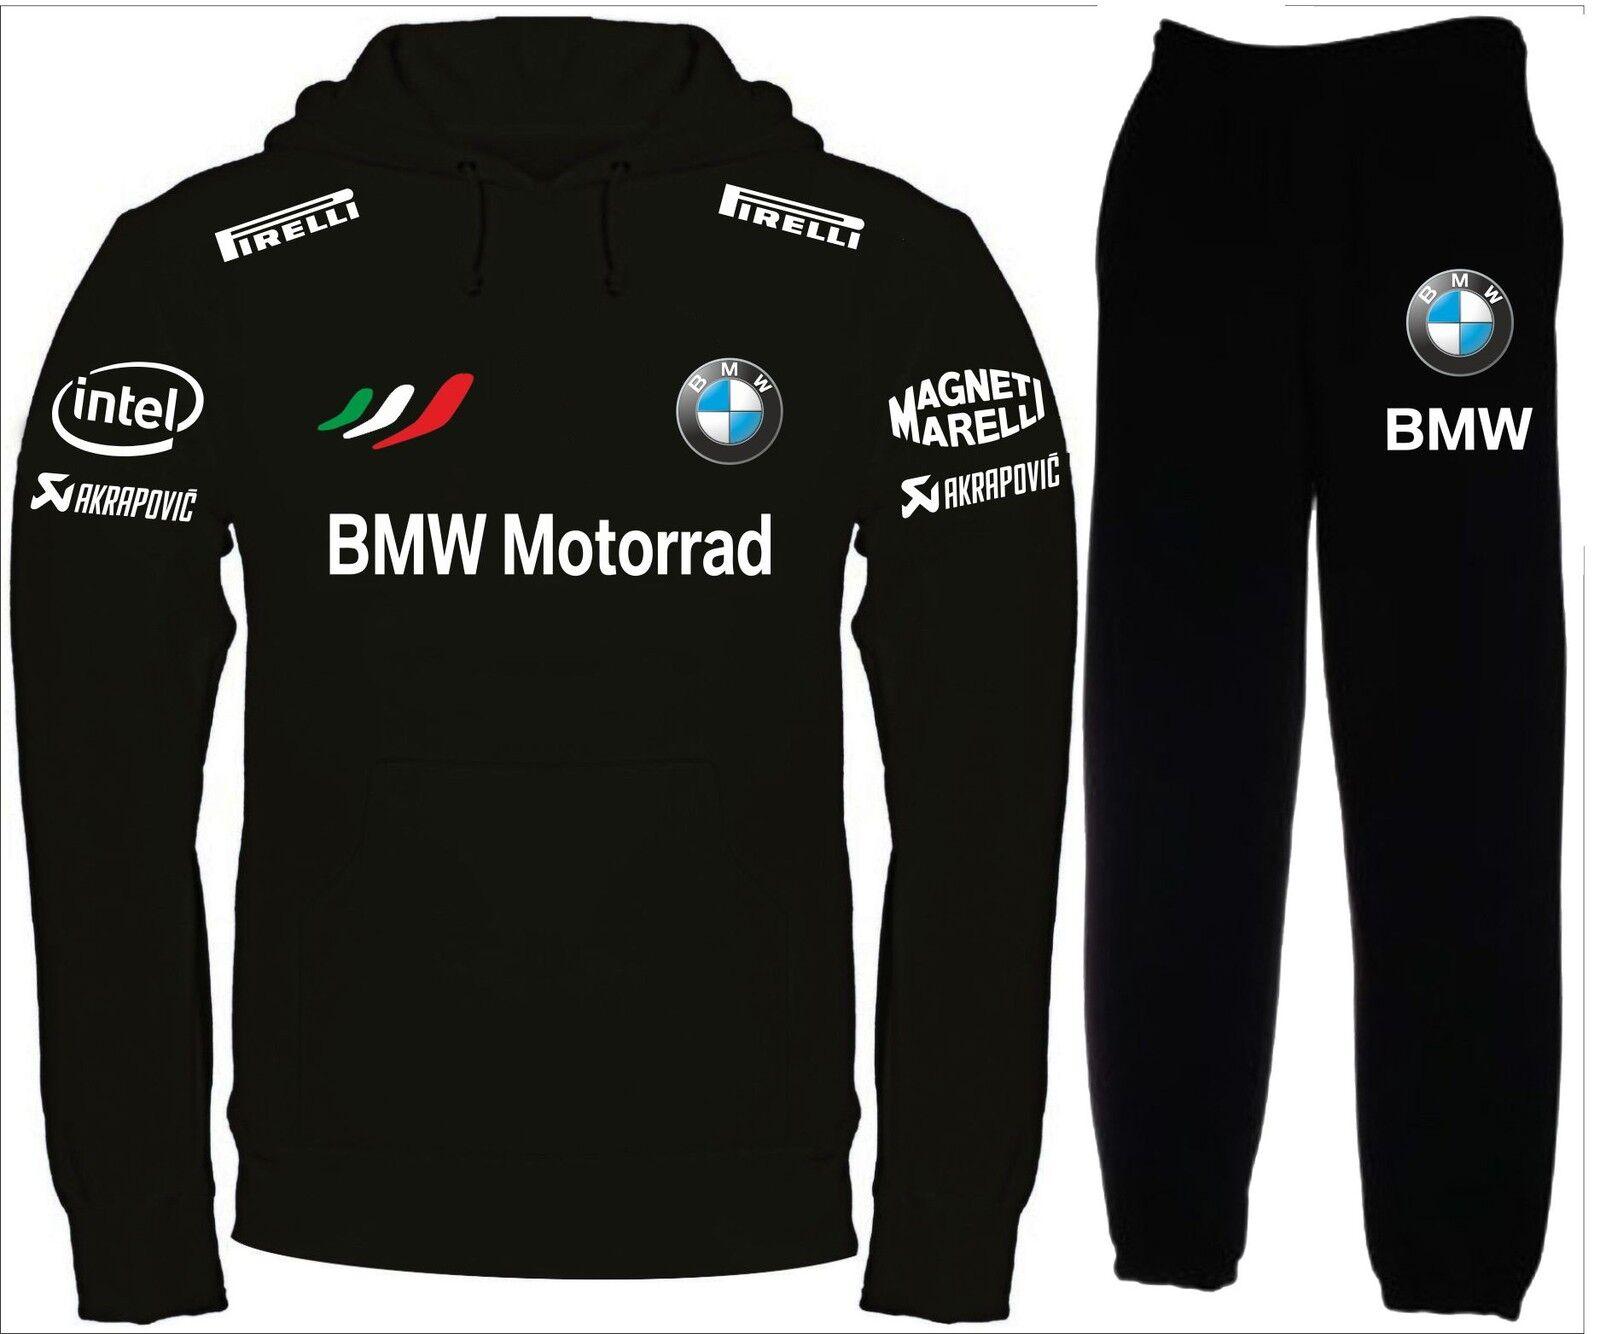 BMW MOTORRAD tuta felpa maglietta polo t-shirt maglia hoodie honda ktm ducati NN